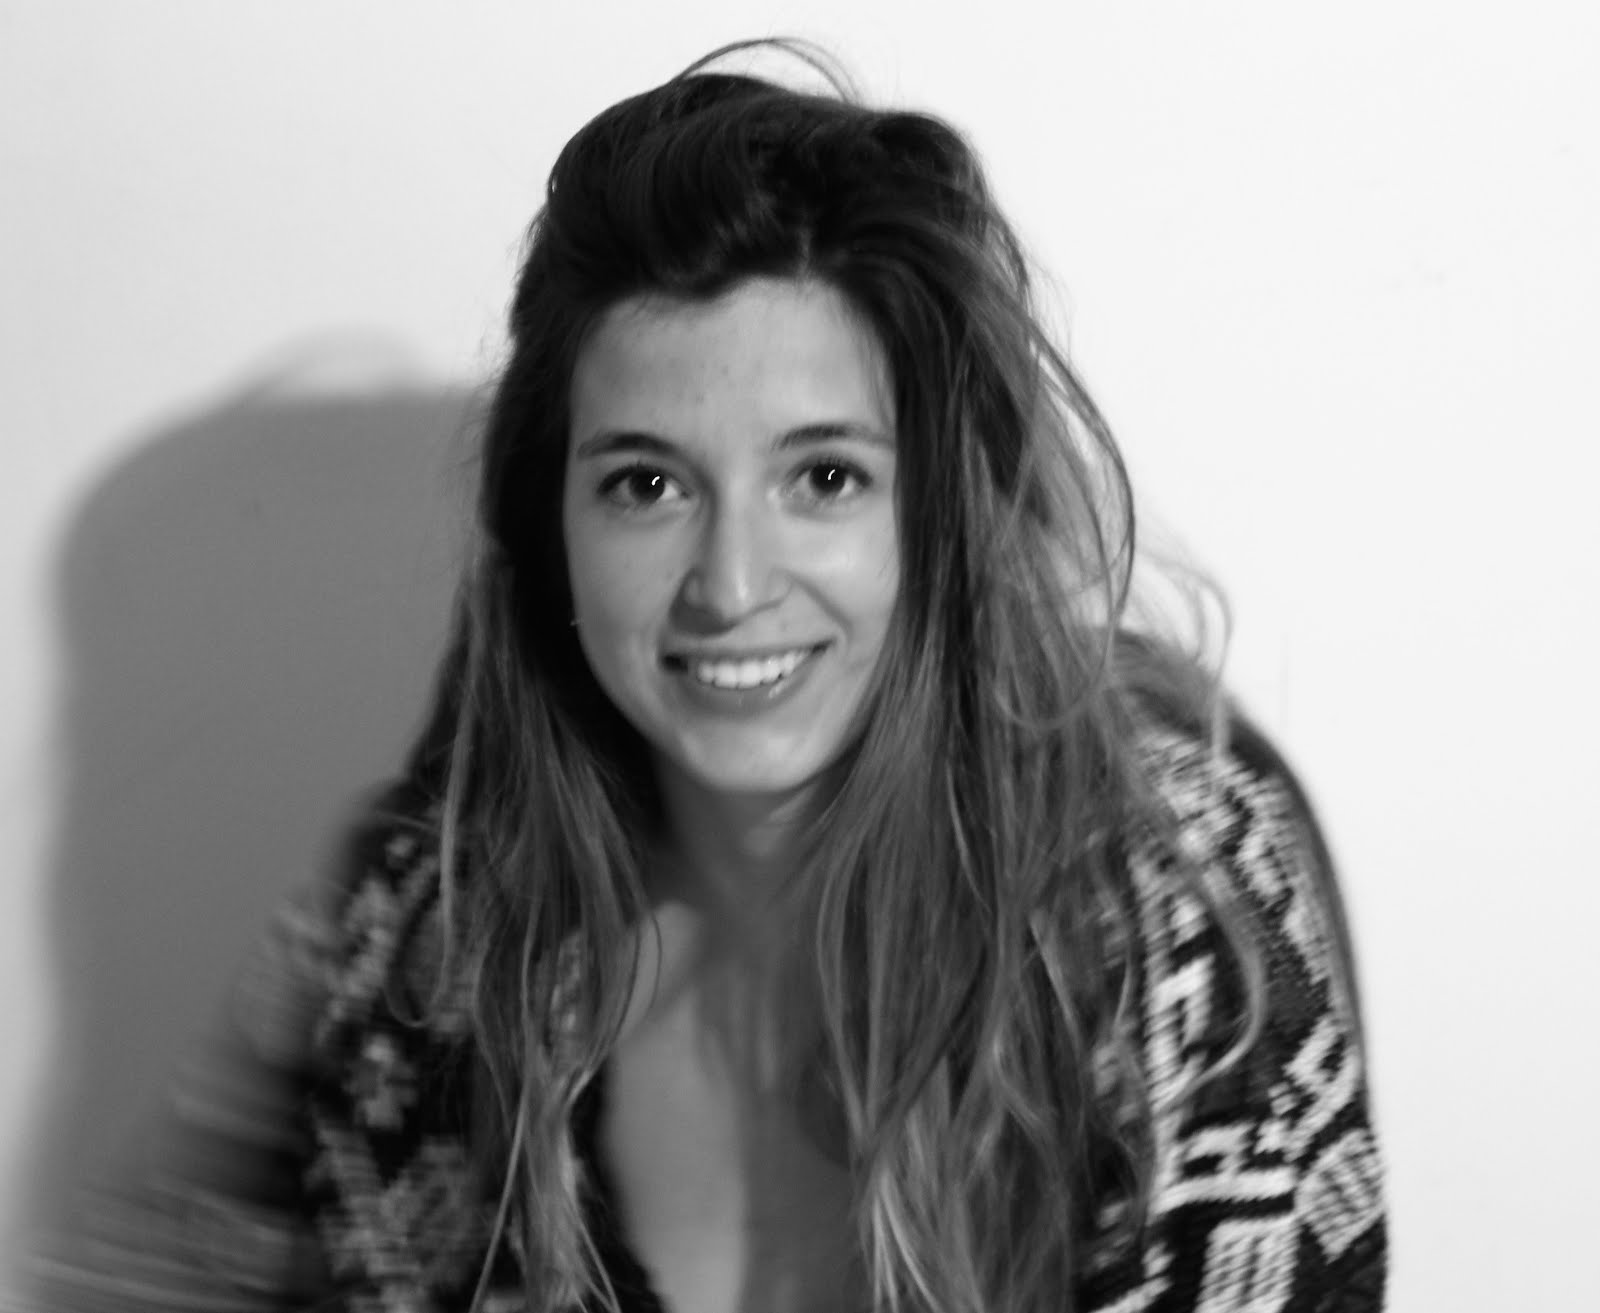 Nataxa Moreno Ruzaba